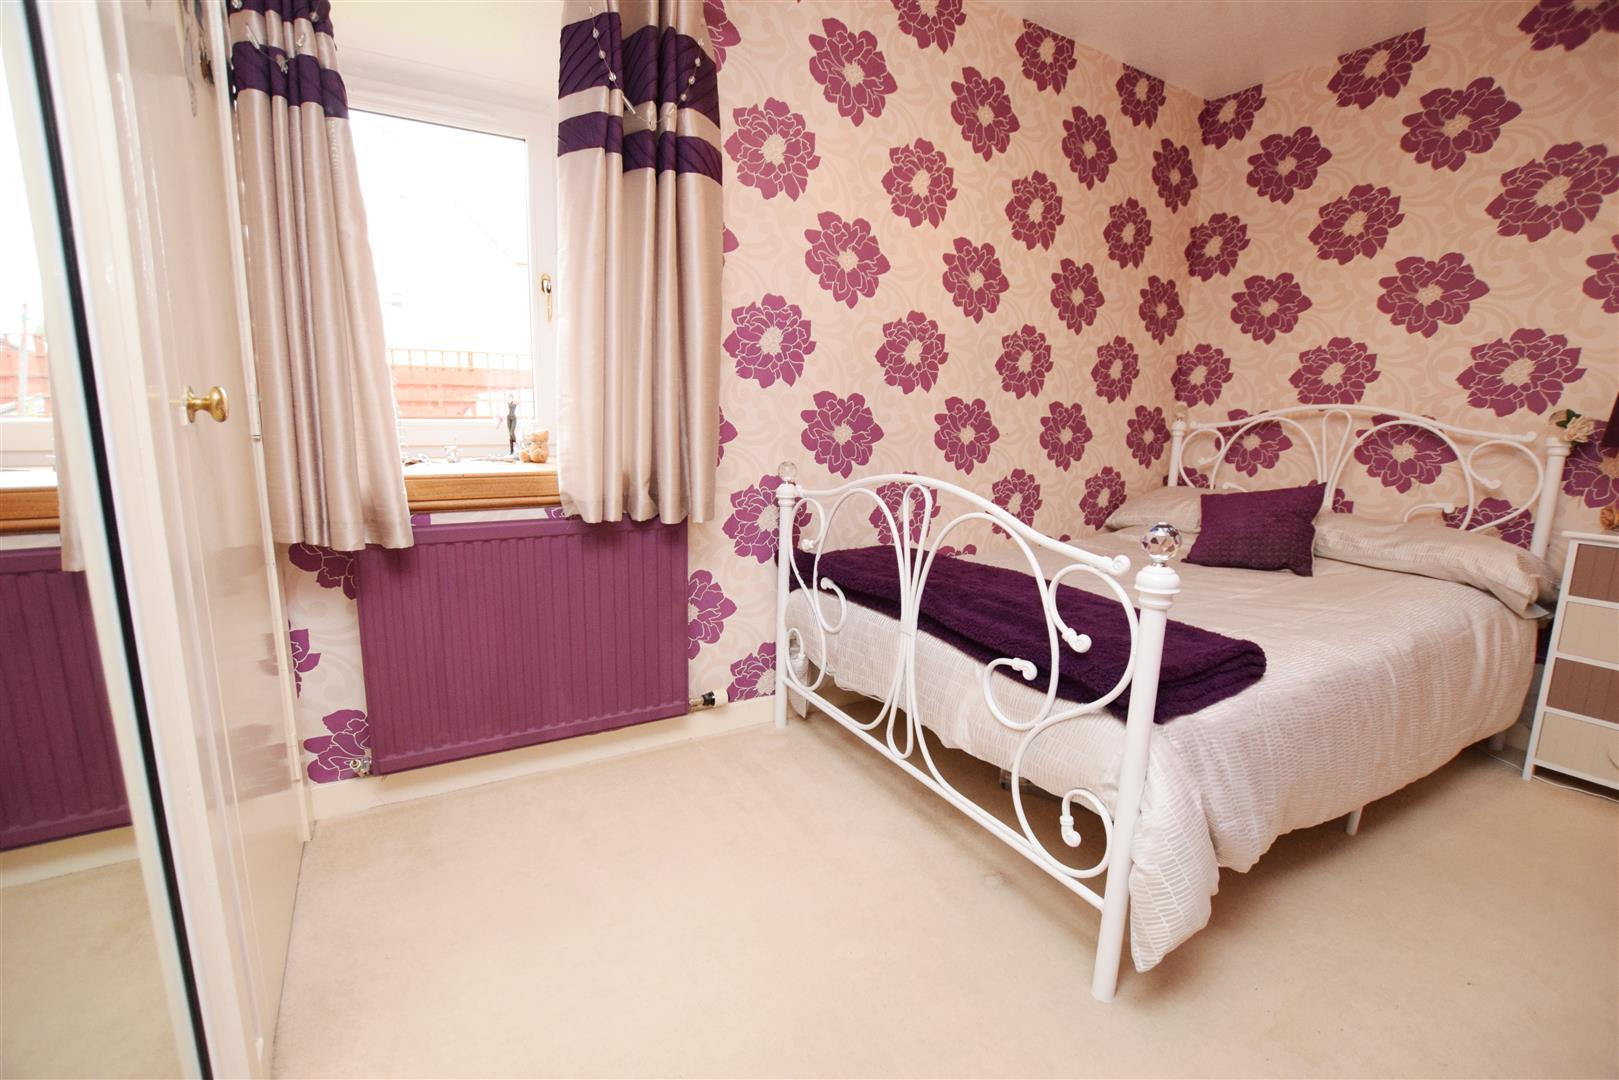 Isla Cottage, Blairgowrie Road, Coupar Angus, Blairgowrie, Perthshire, PH13 9AT, UK